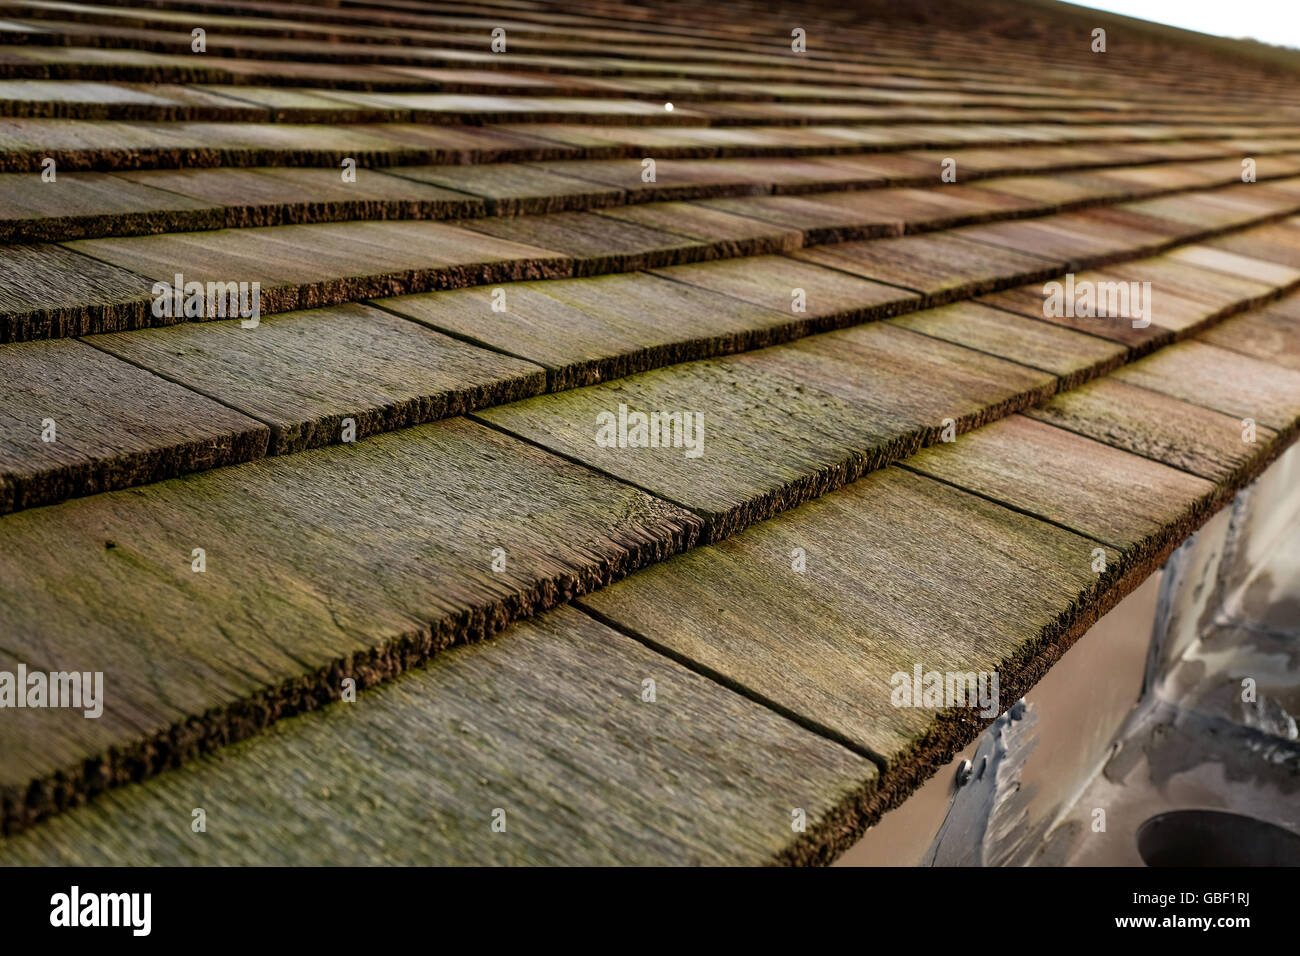 Rot Zeder Schindeln Dachziegel Stockfoto Bild 110354150 Alamy